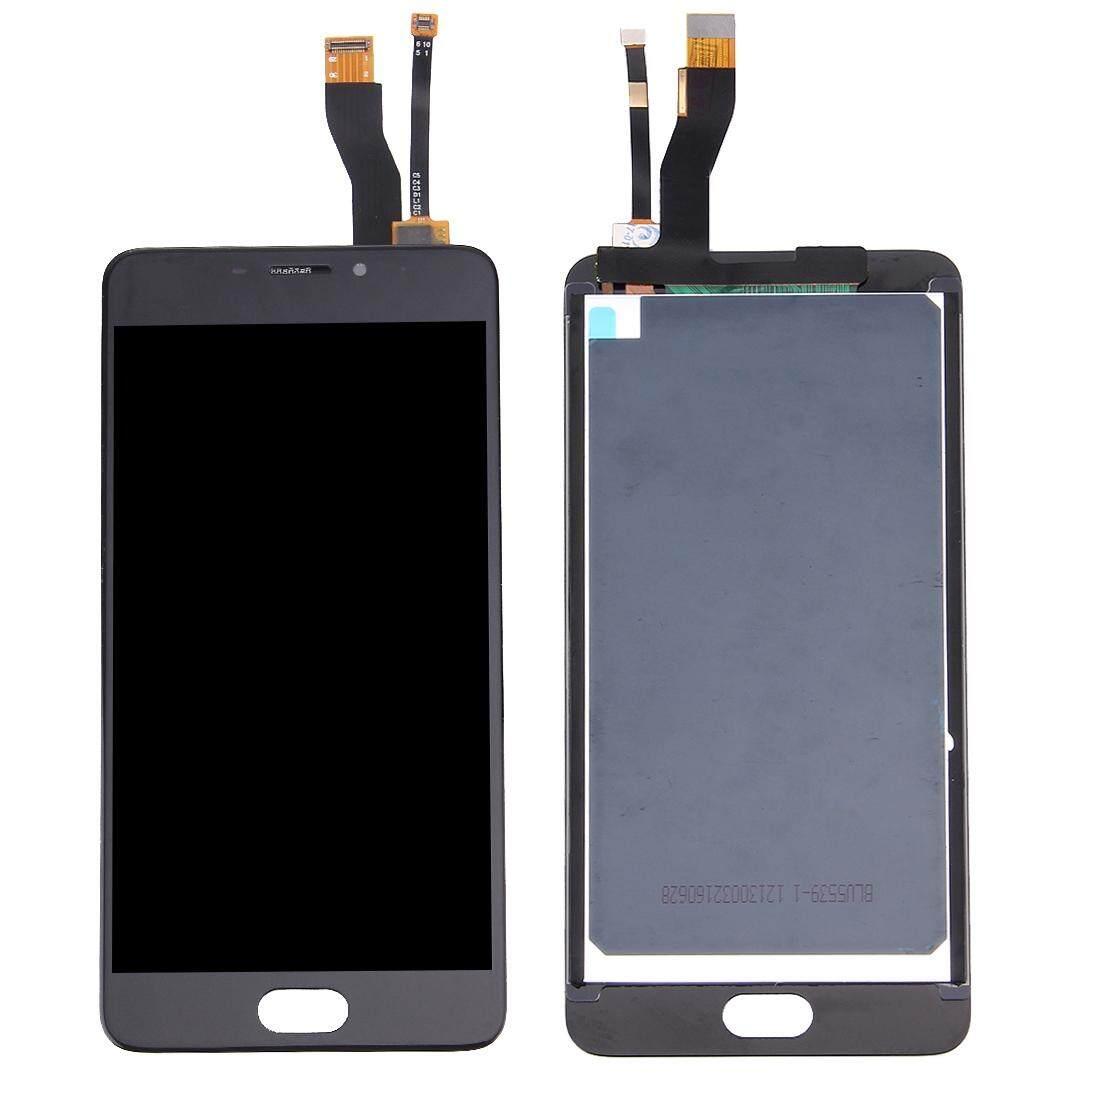 Meizu M5 Catatan/Meilan Note 5 Layar LCD dan Digitizer Penuh Perakitan (Hitam)